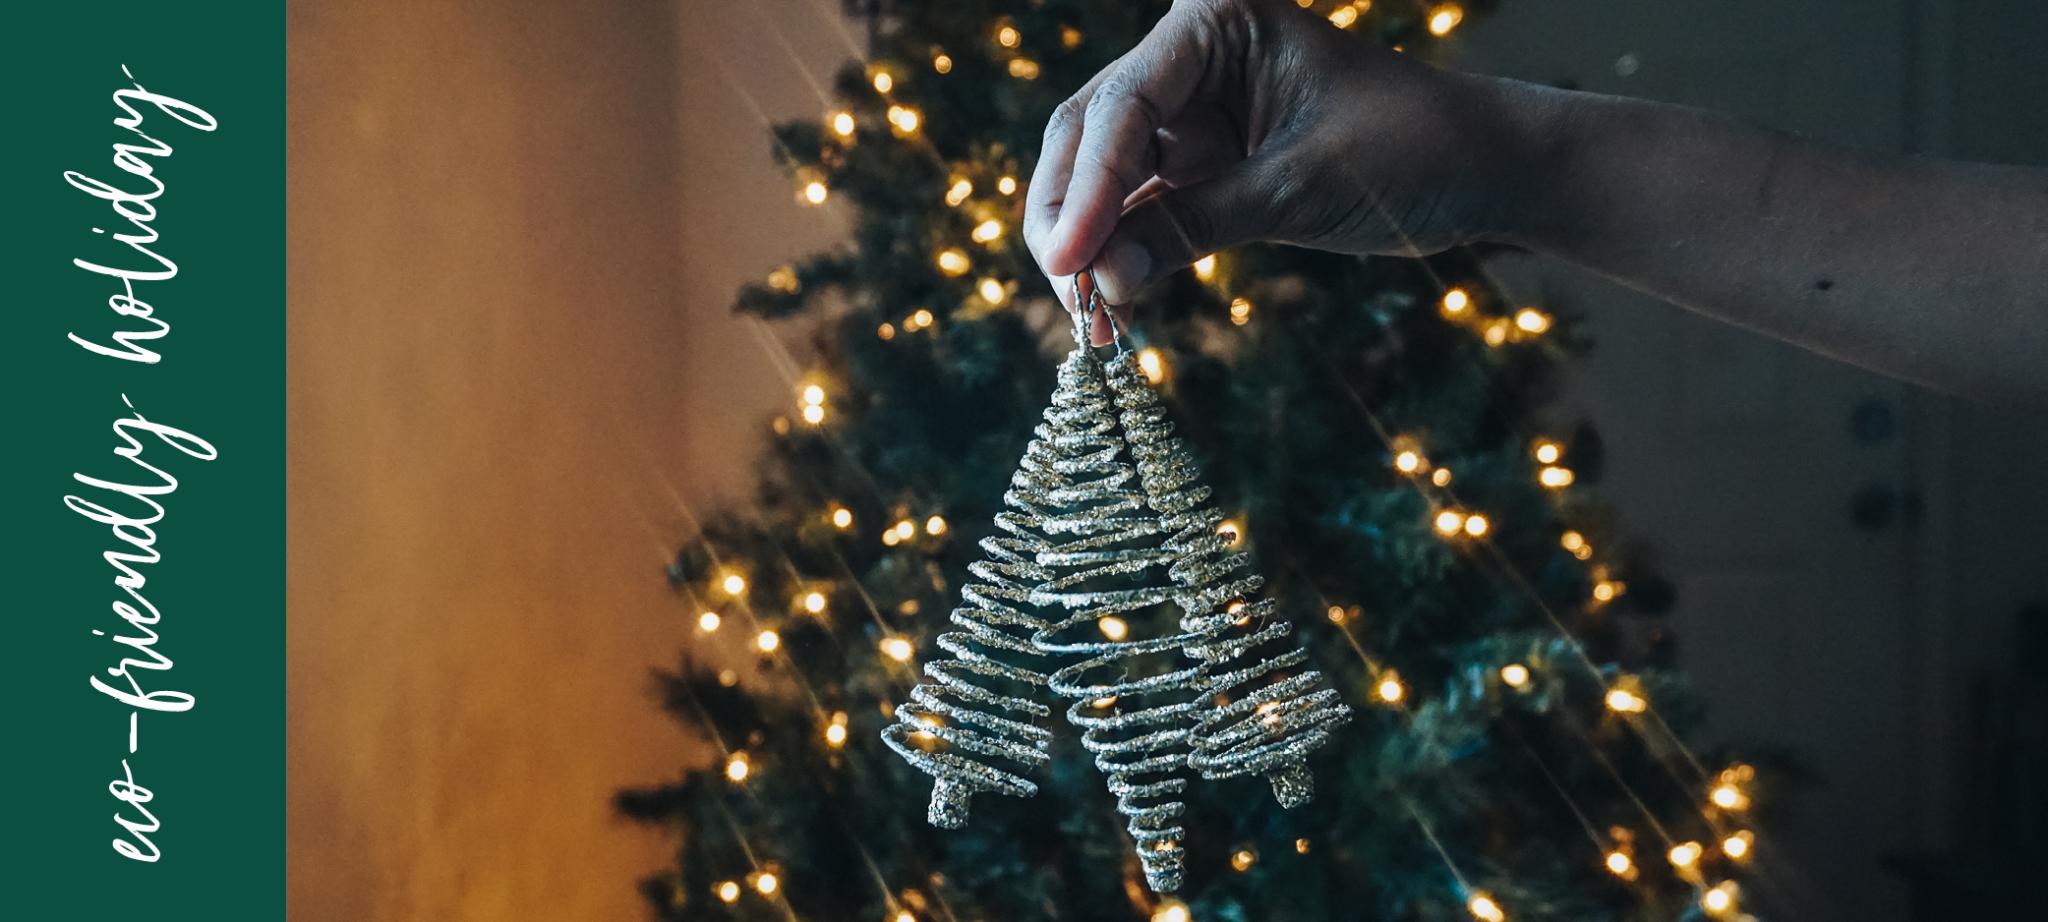 Eco-Friendly Christmas Decor - Old World New